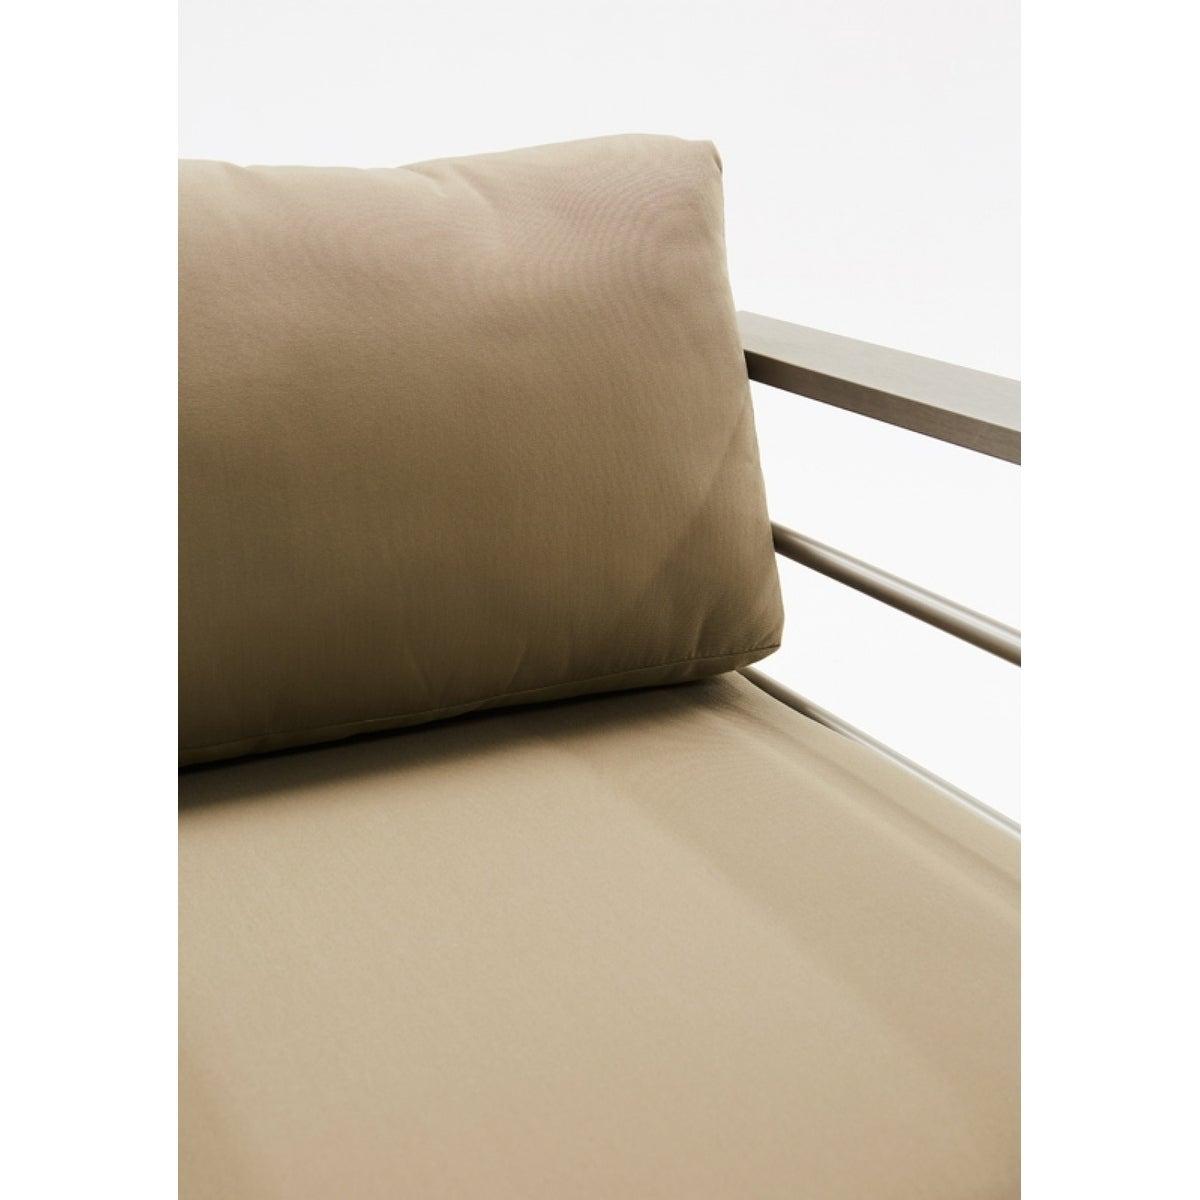 Sensational Renava Solana Outdoor Grey Sofa Set Alphanode Cool Chair Designs And Ideas Alphanodeonline